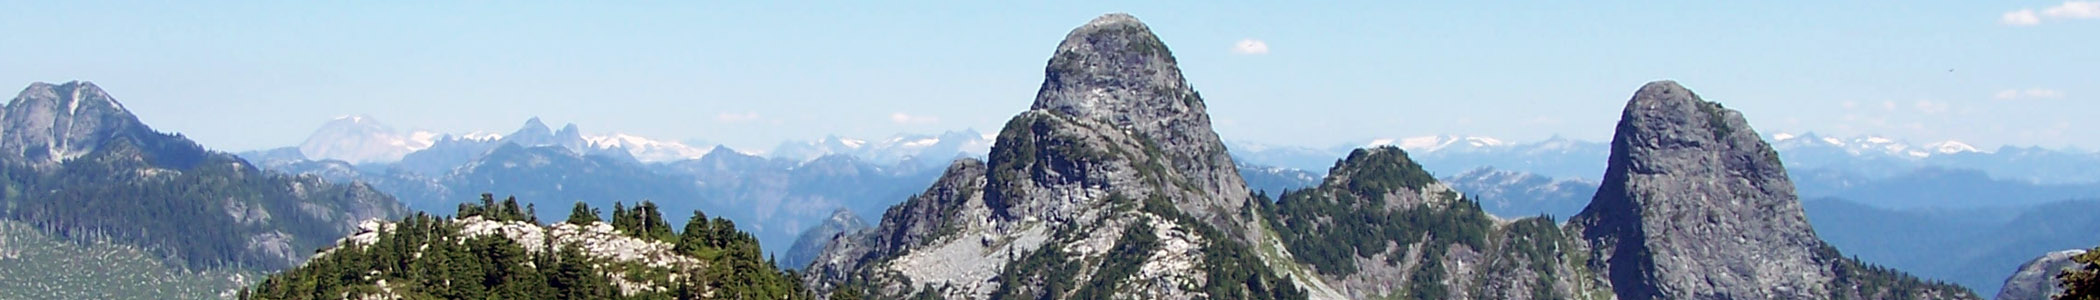 The Lions peaks (British Columbia)